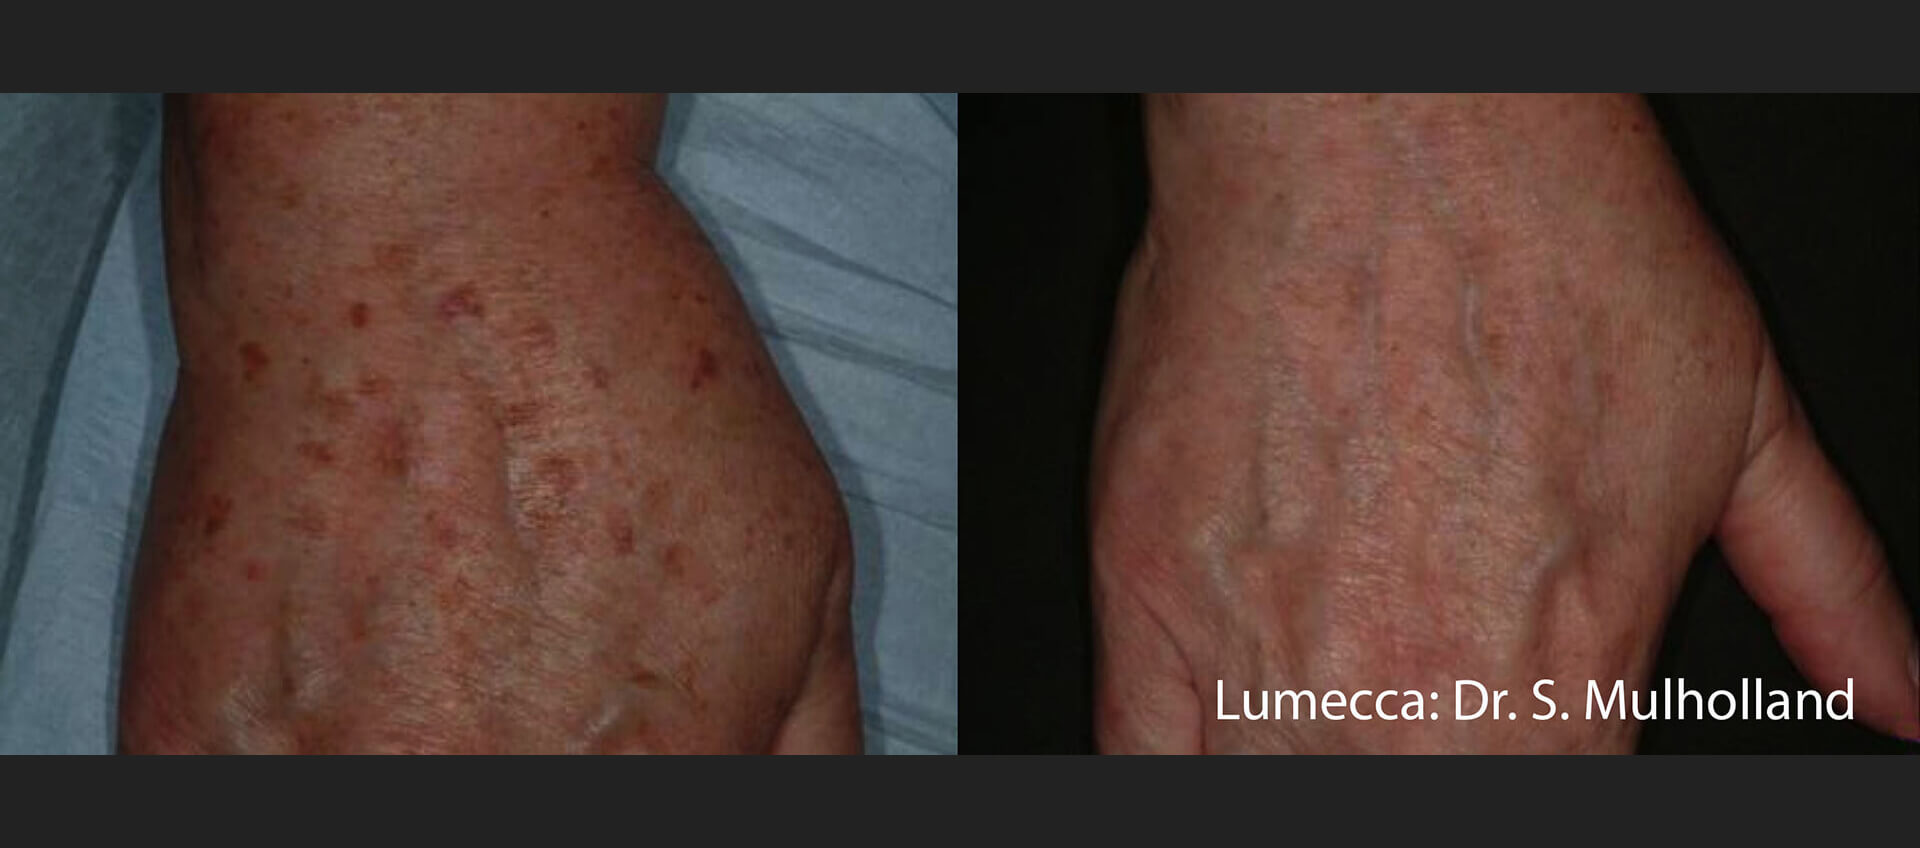 Rezultate Tratament leziuni pigmentare cu apl;icatorul Inmode Lumecca